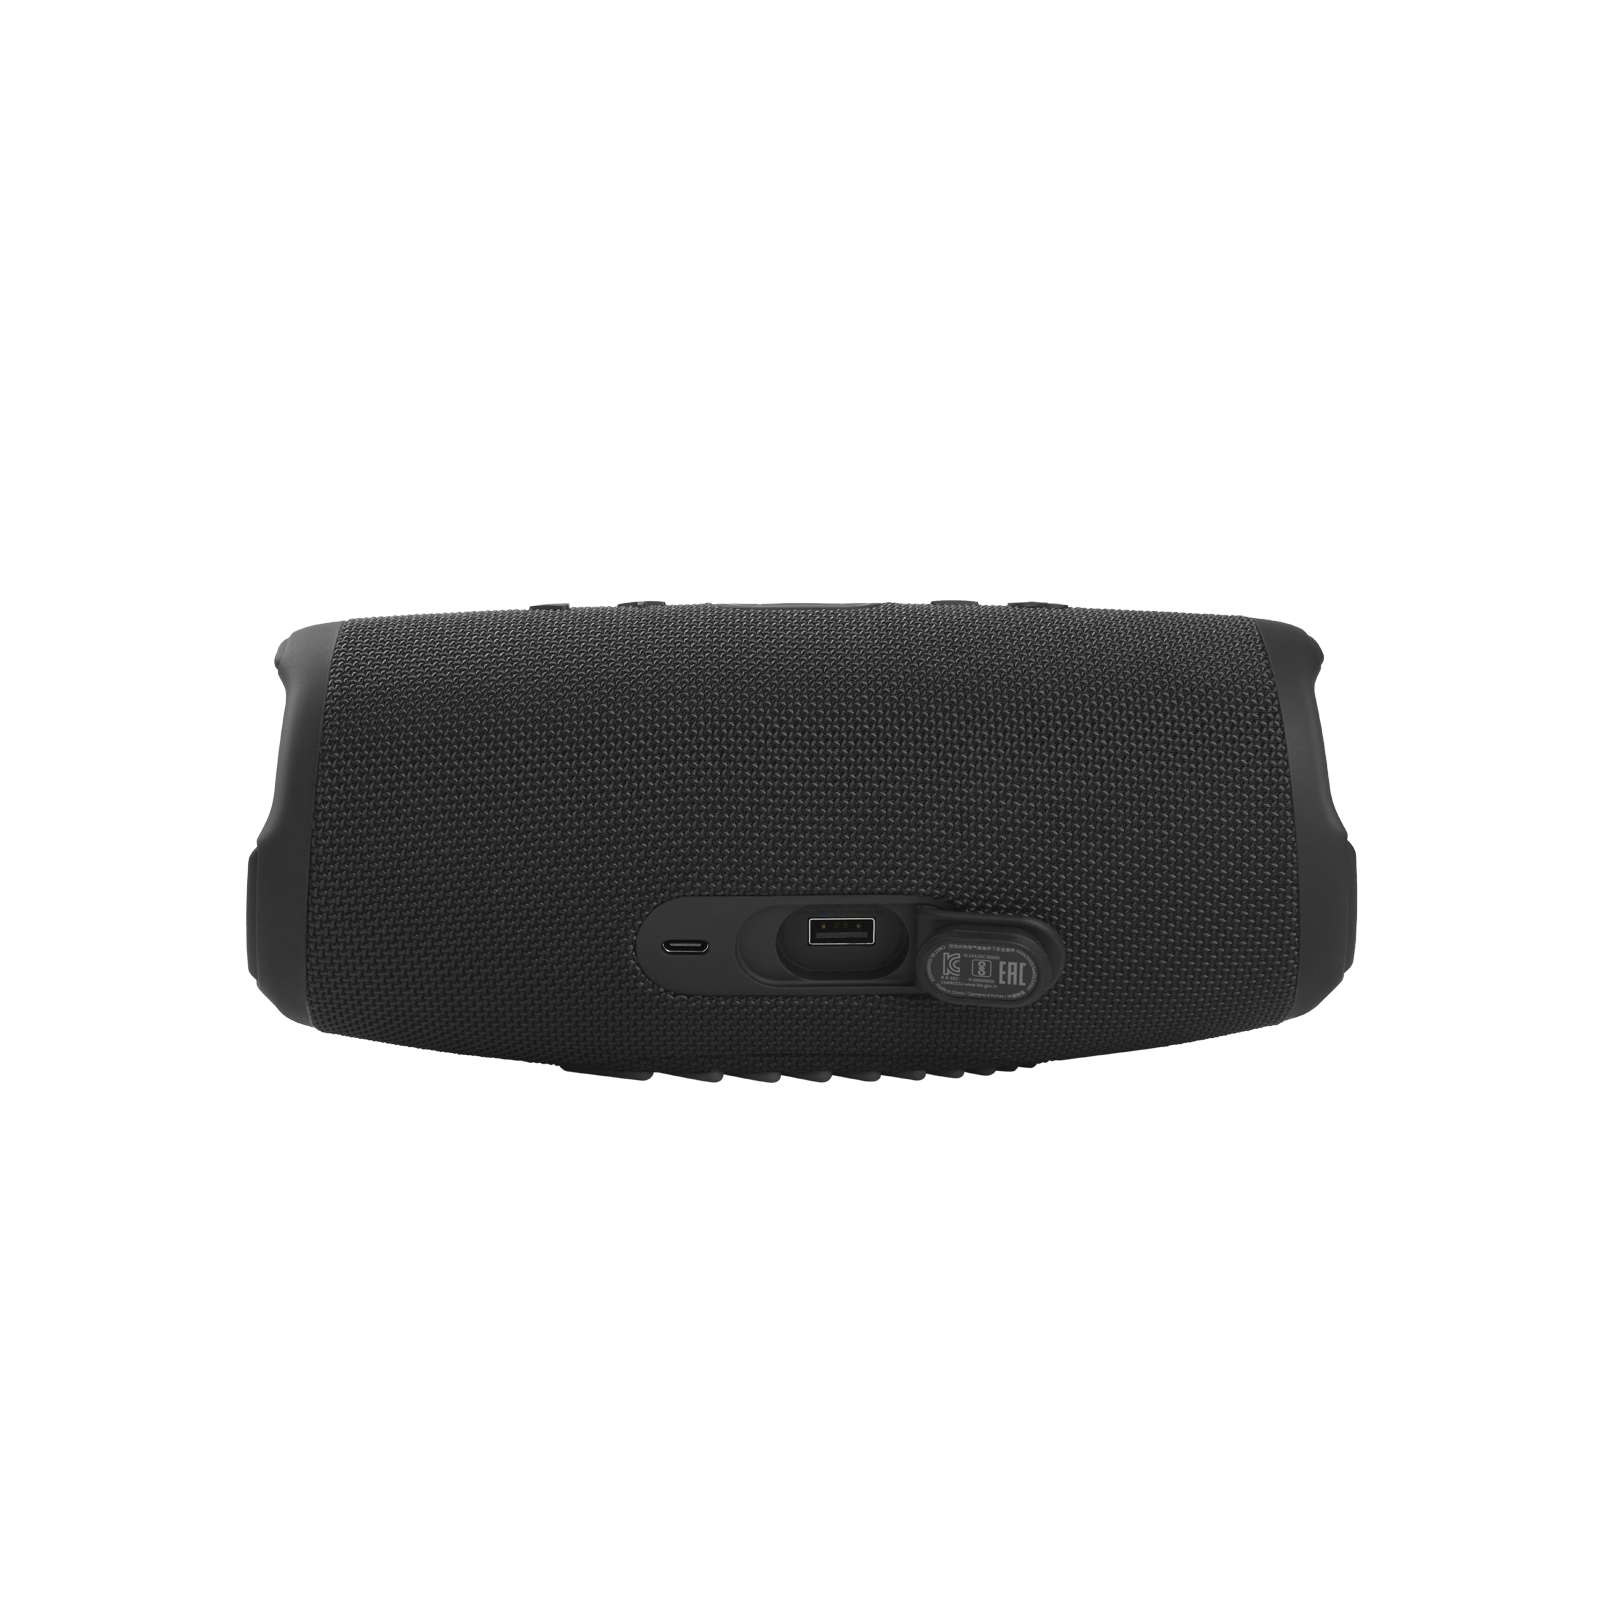 JBL Charge 5 Tomorrowland Edition - Black - Portable Waterproof Speaker with Powerbank - Detailshot 1